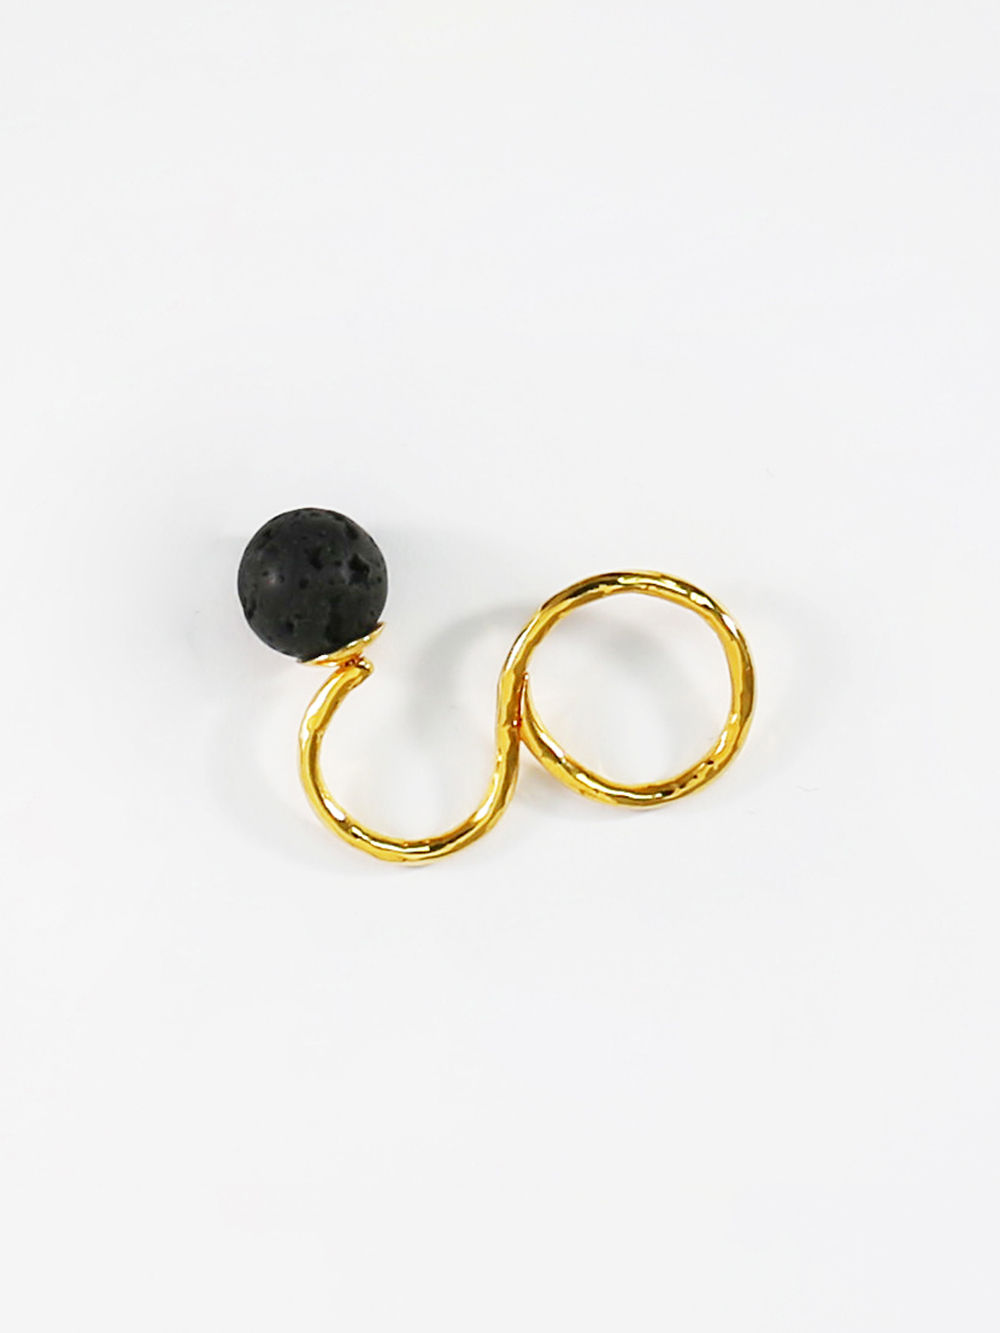 Buy Golden Black Brass Double Finger Ring online at Theloom